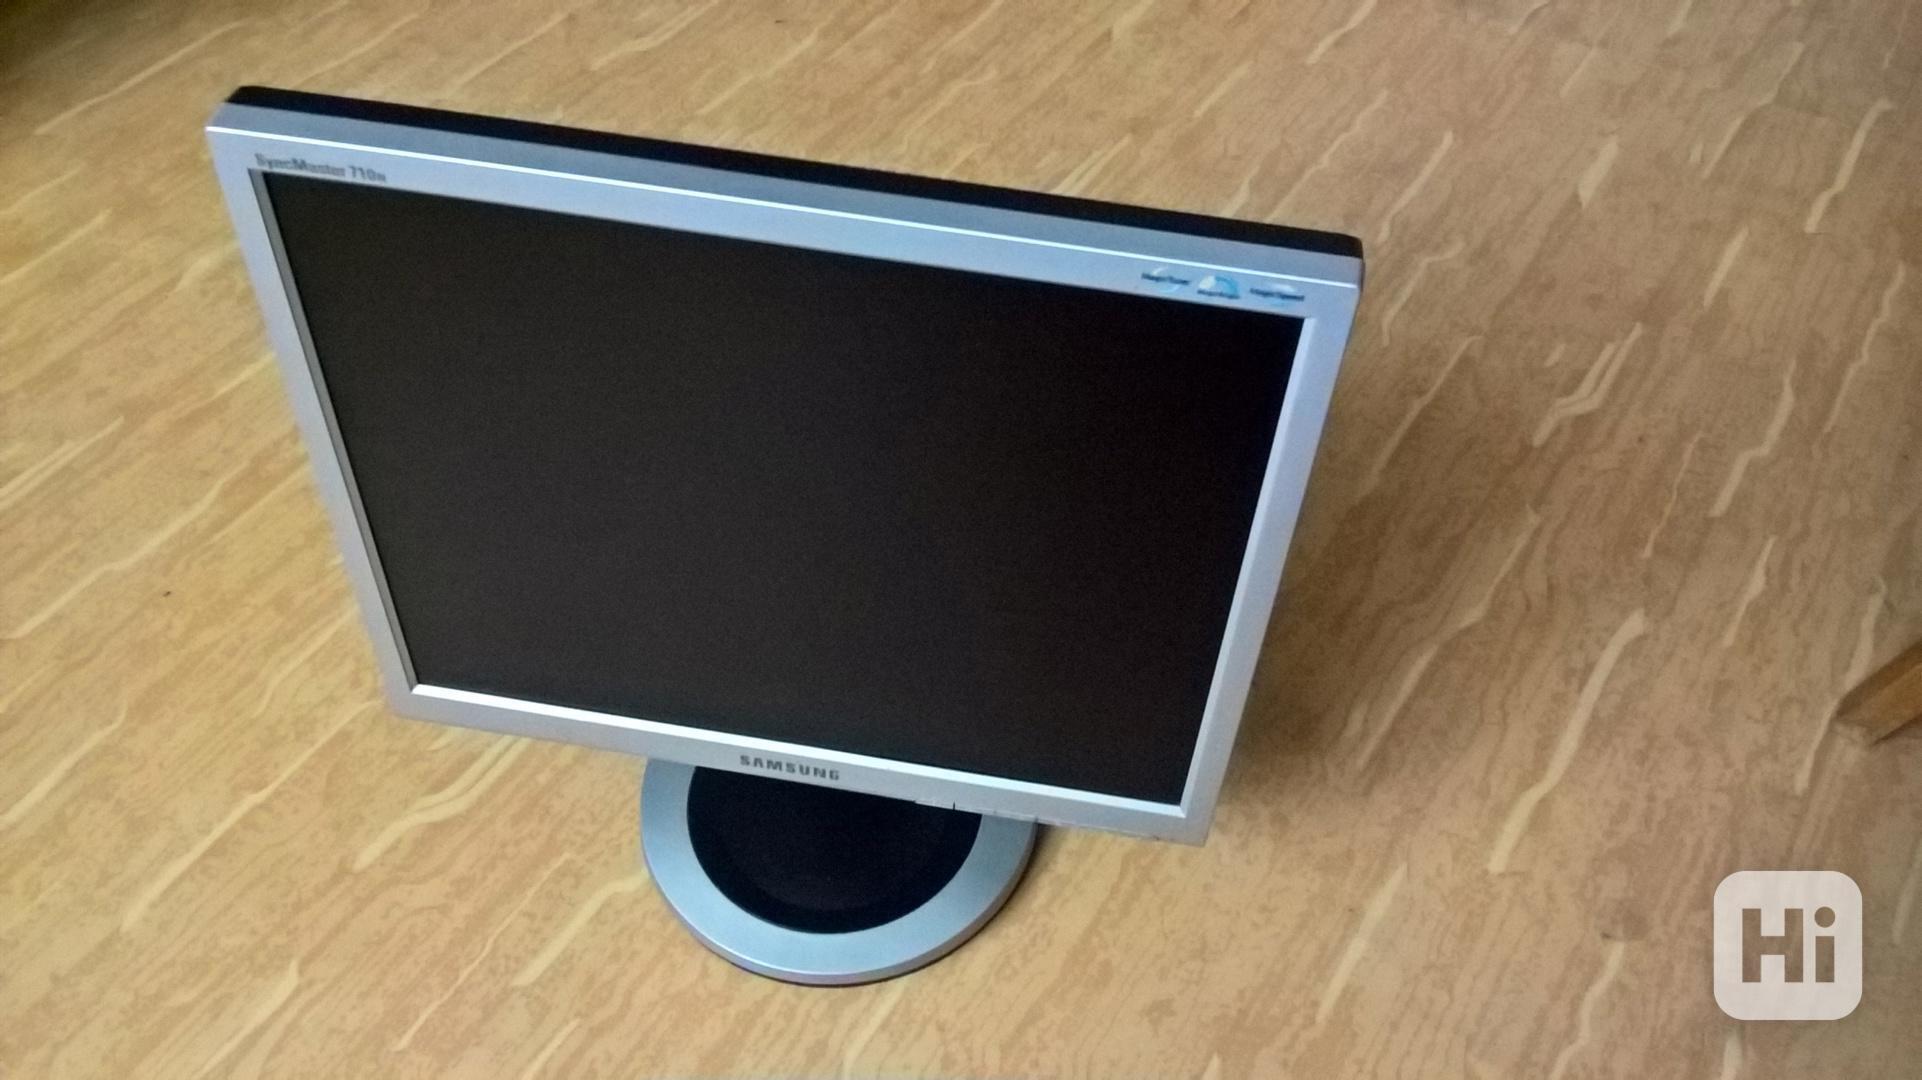 "Monitor SAMSUNG 17"" - foto 1"